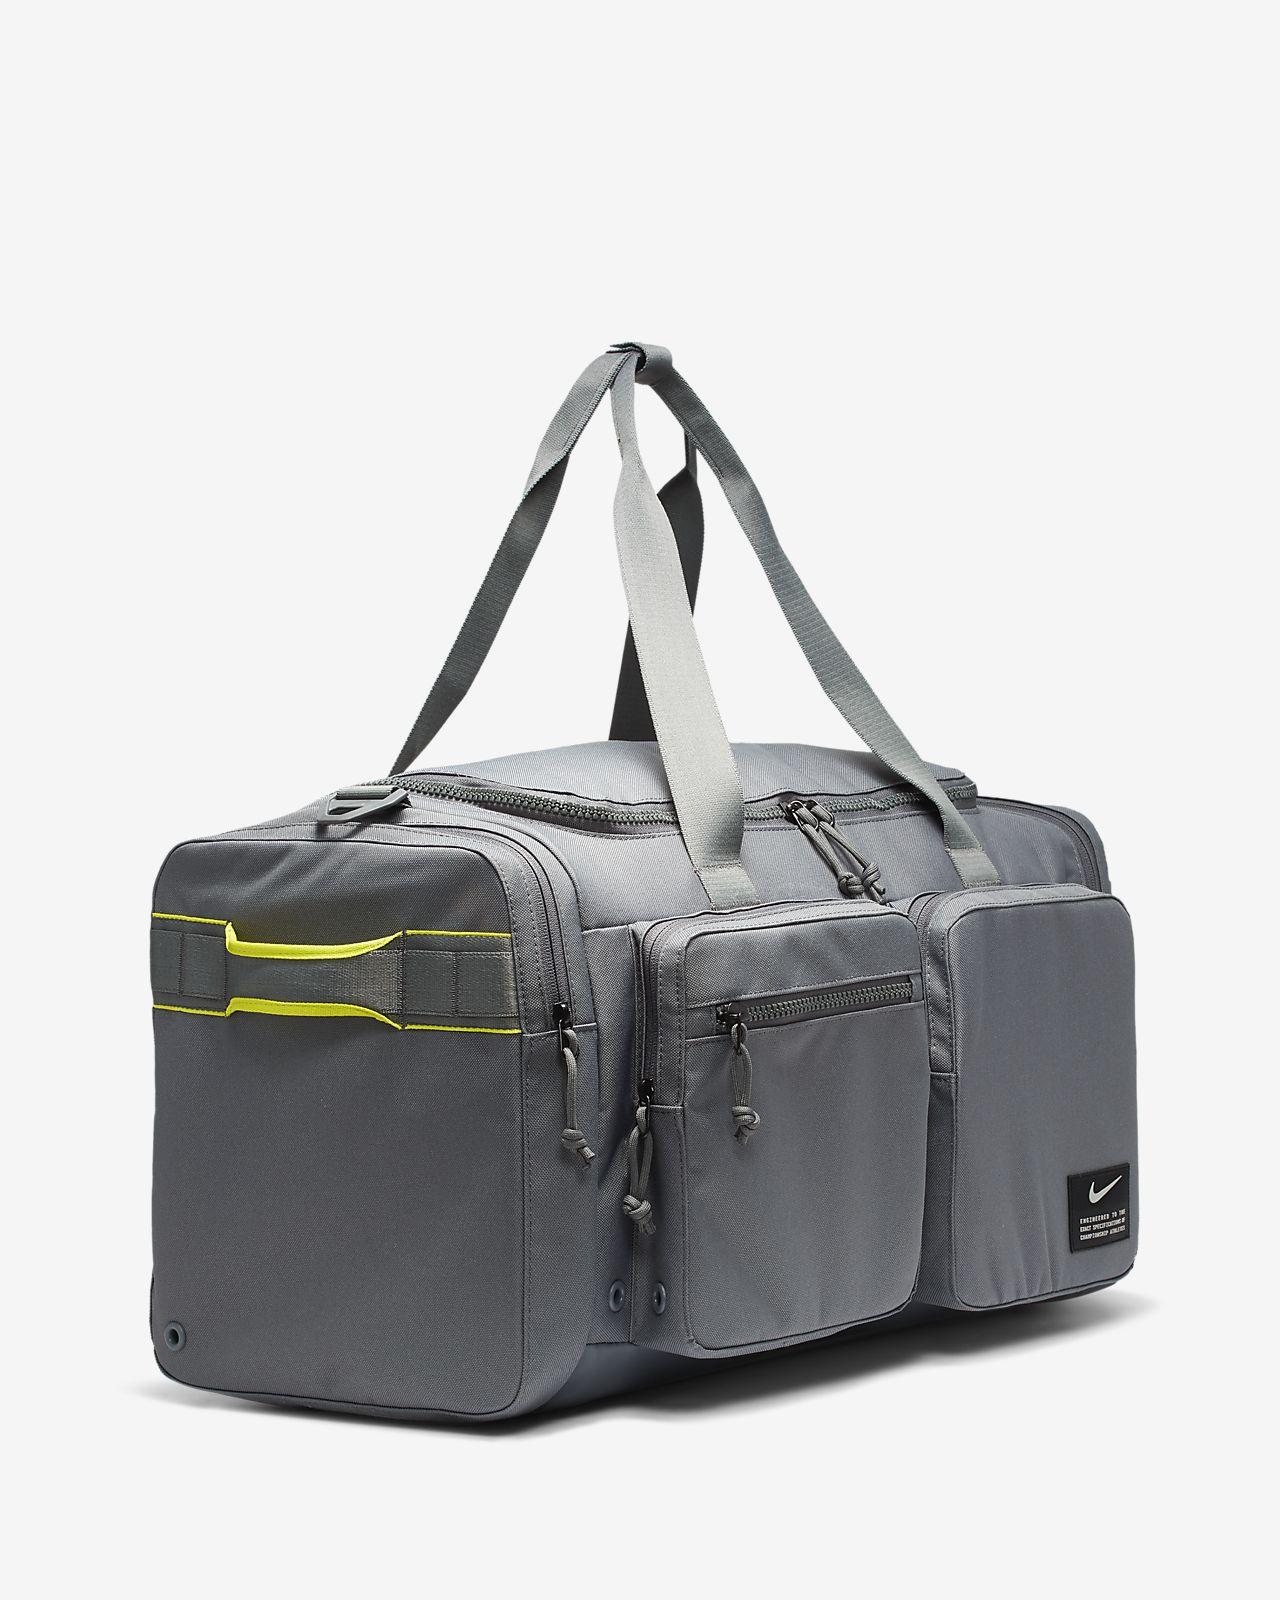 Best Nike Utility Duffel Backpack Soccer Bag of 2020 Top